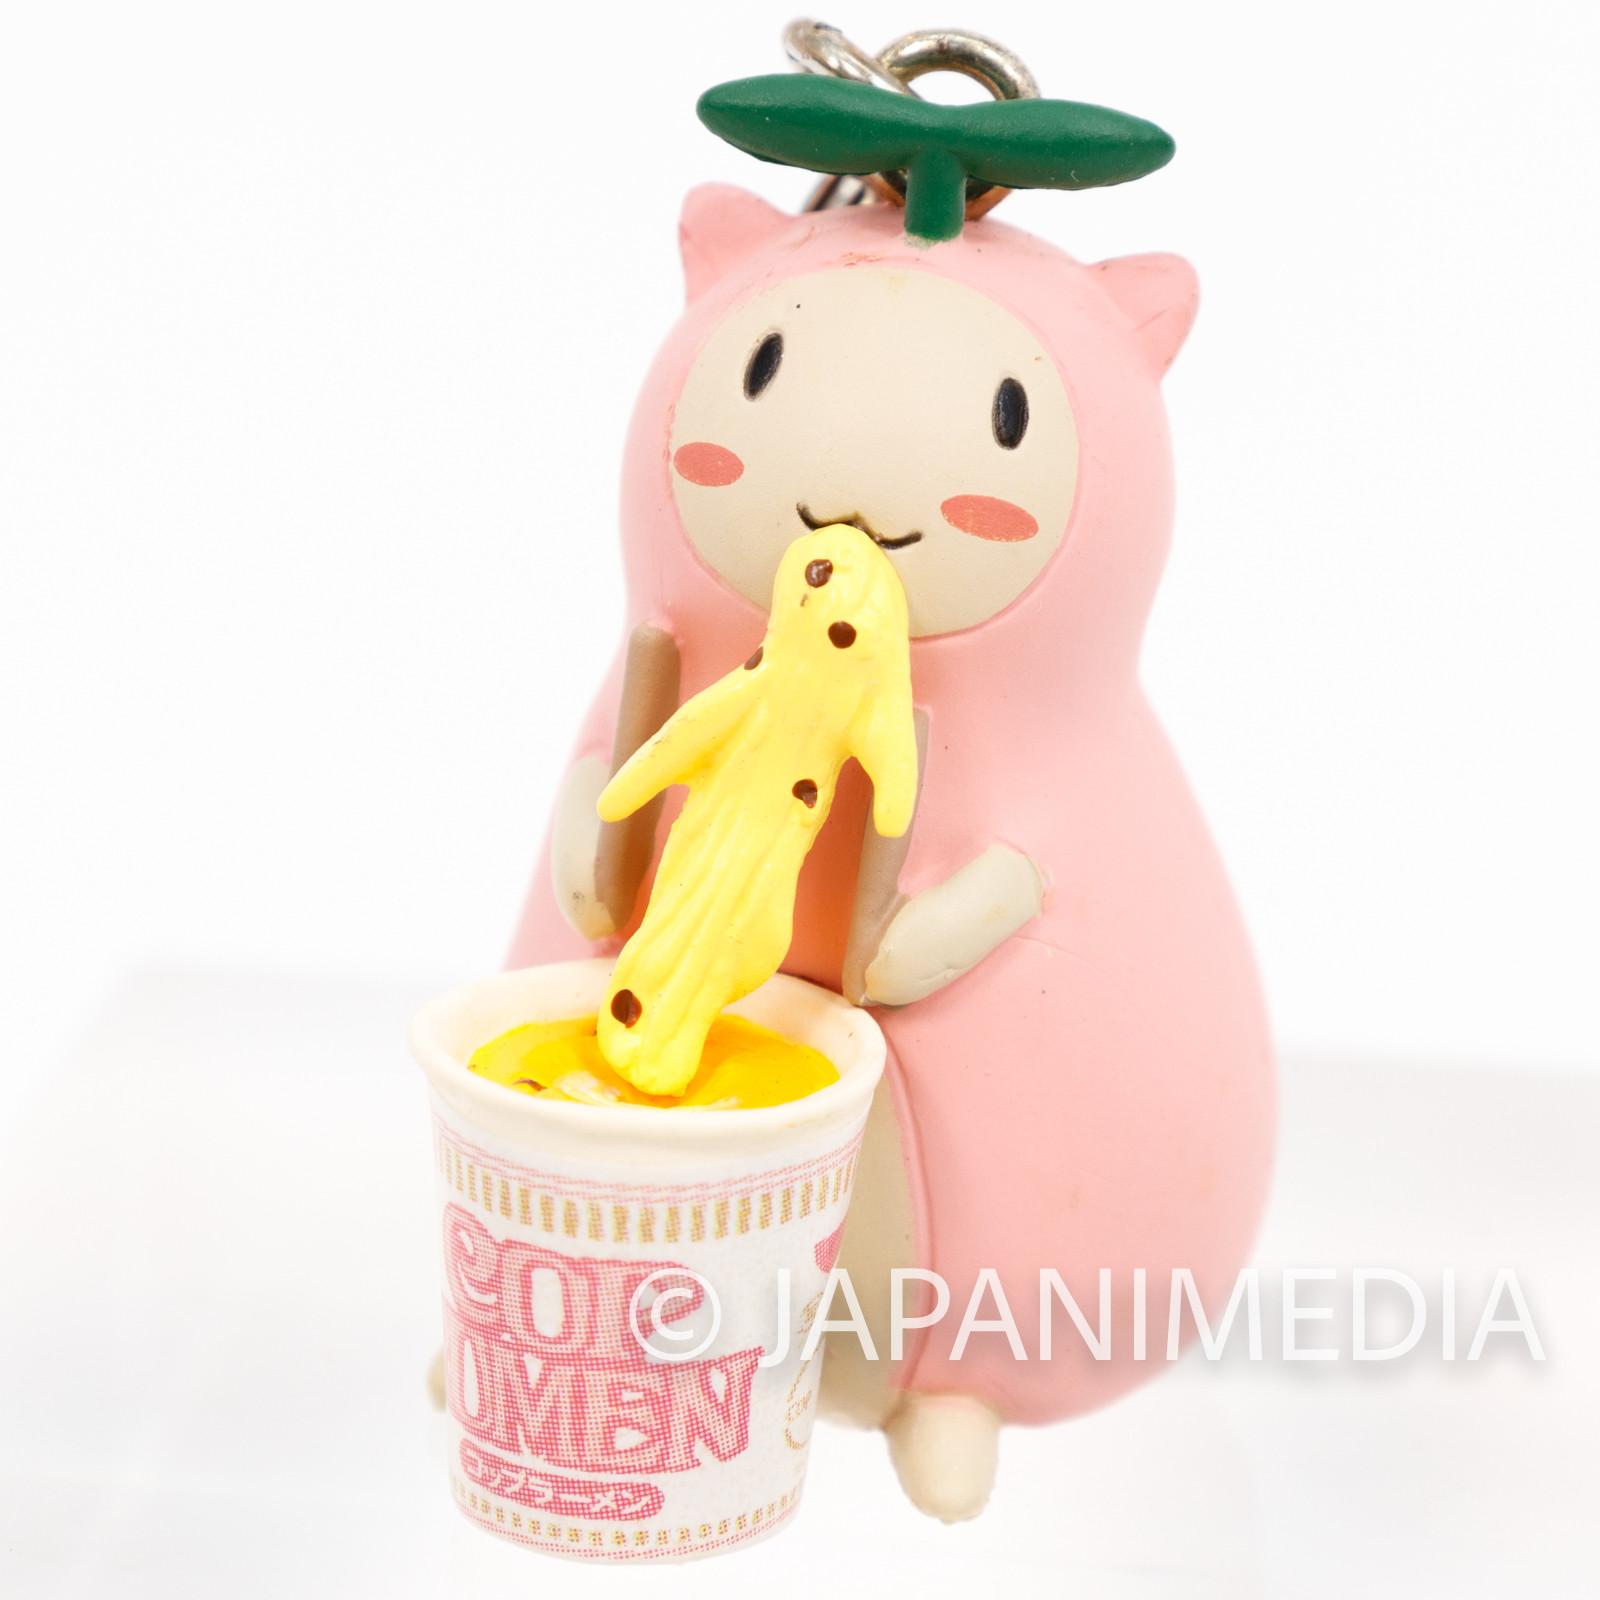 Waiting In The Summer Ano Natsu de Matteru RINON Mascot Figure Strap JAPAN